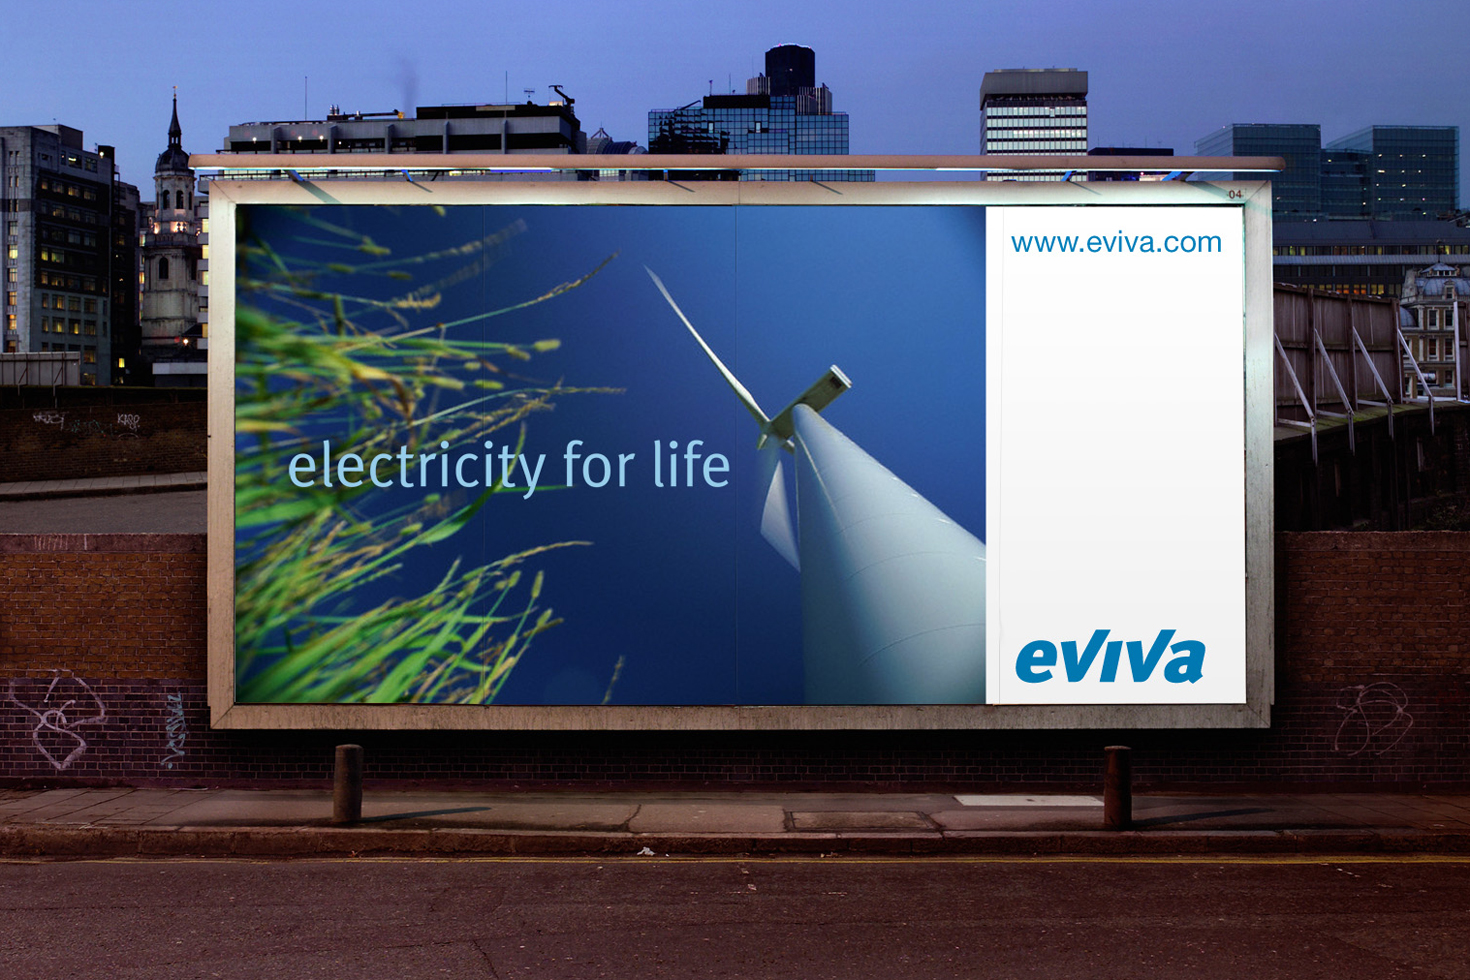 Eviva billboard poster